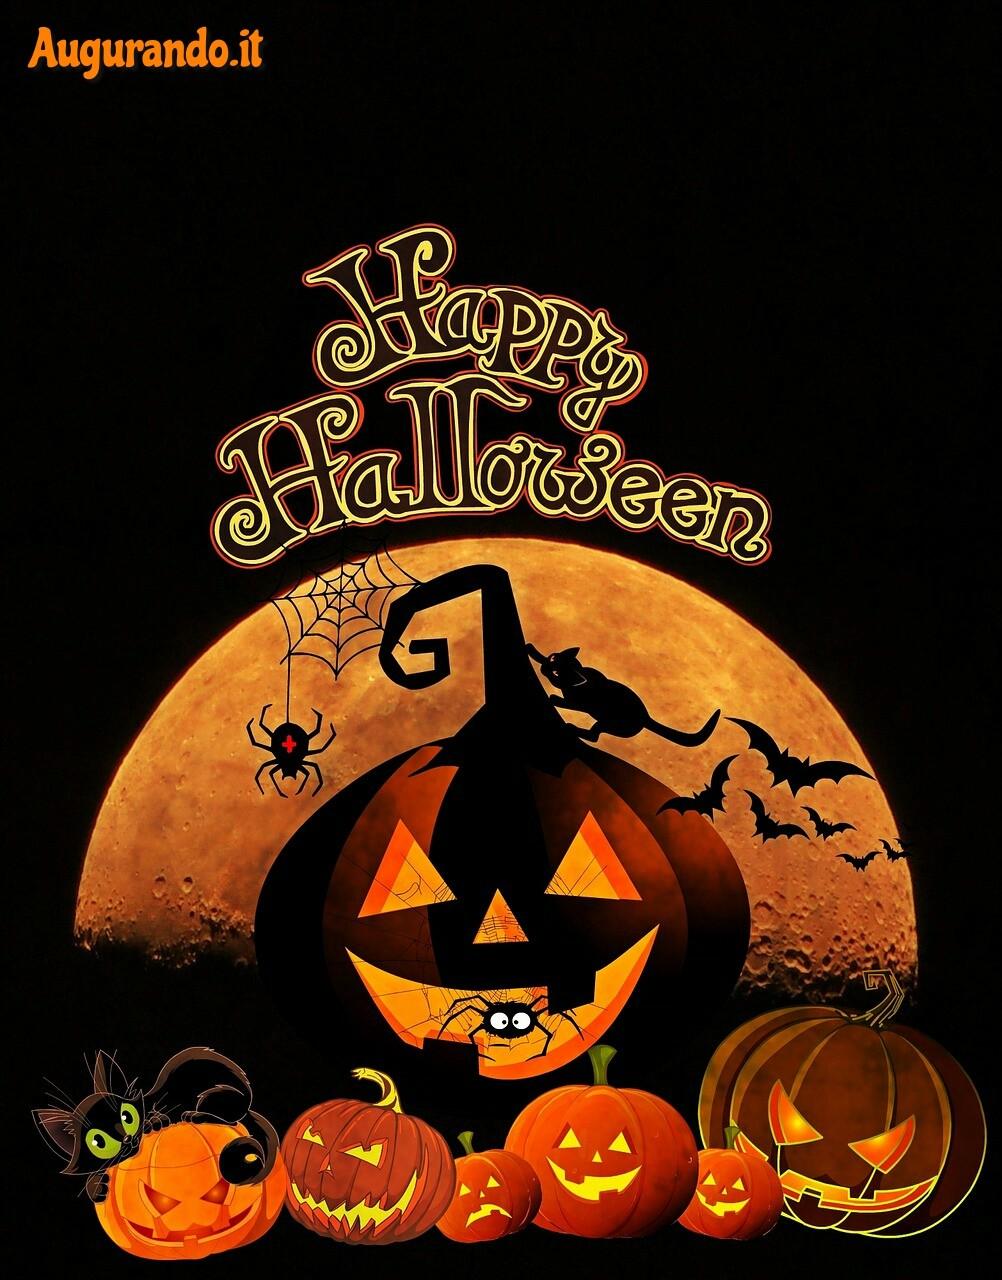 Immagini Halloween Spaventosamente Belle